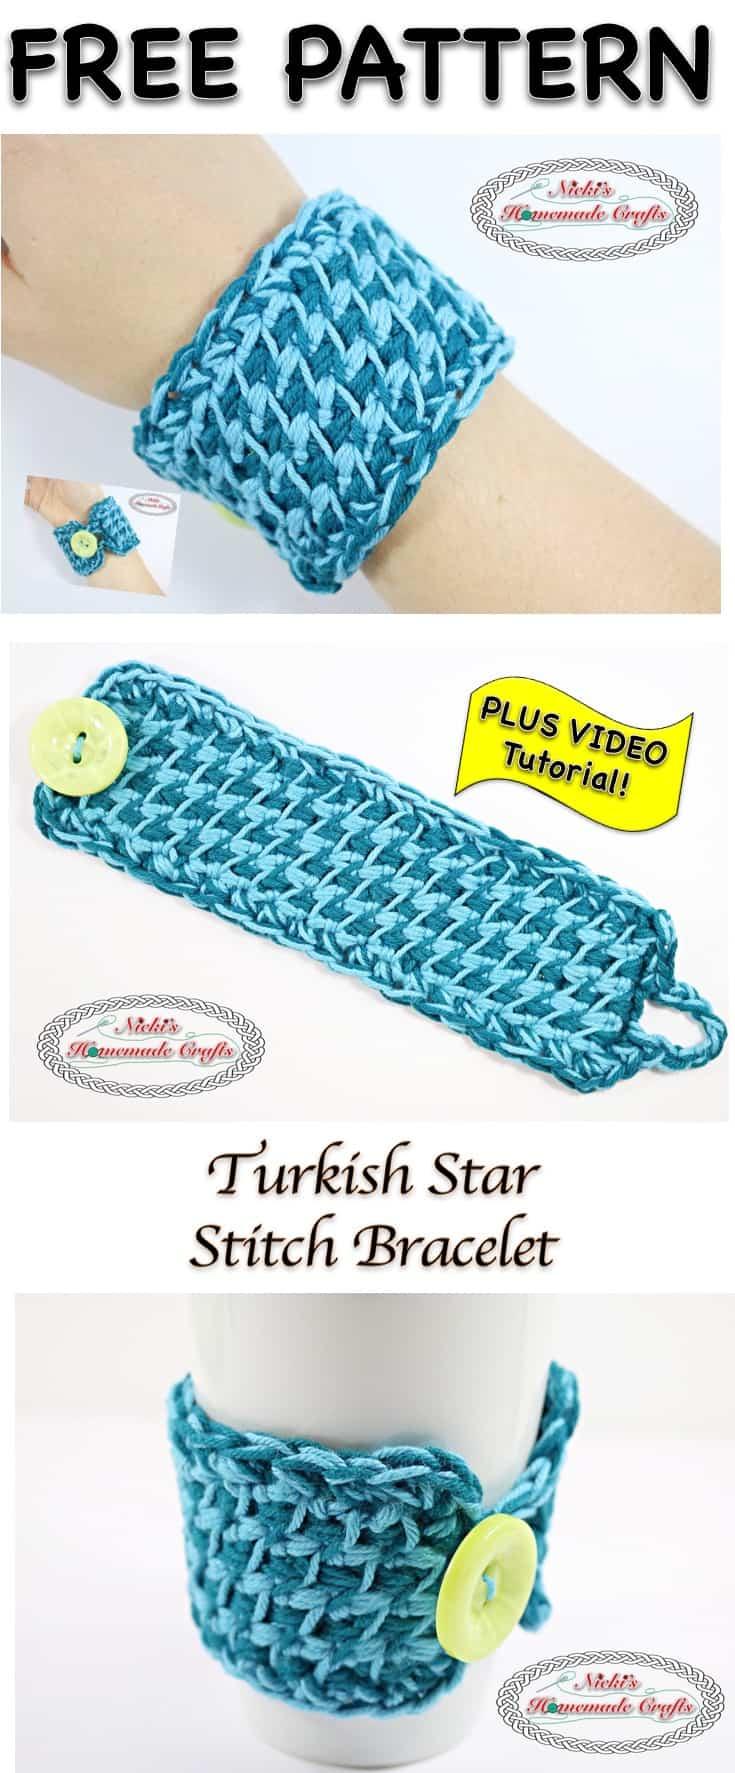 Turkish Star Stitch Bracelet - Free Crochet Pattern and Tutorial by Nicki's Homemade Crafts